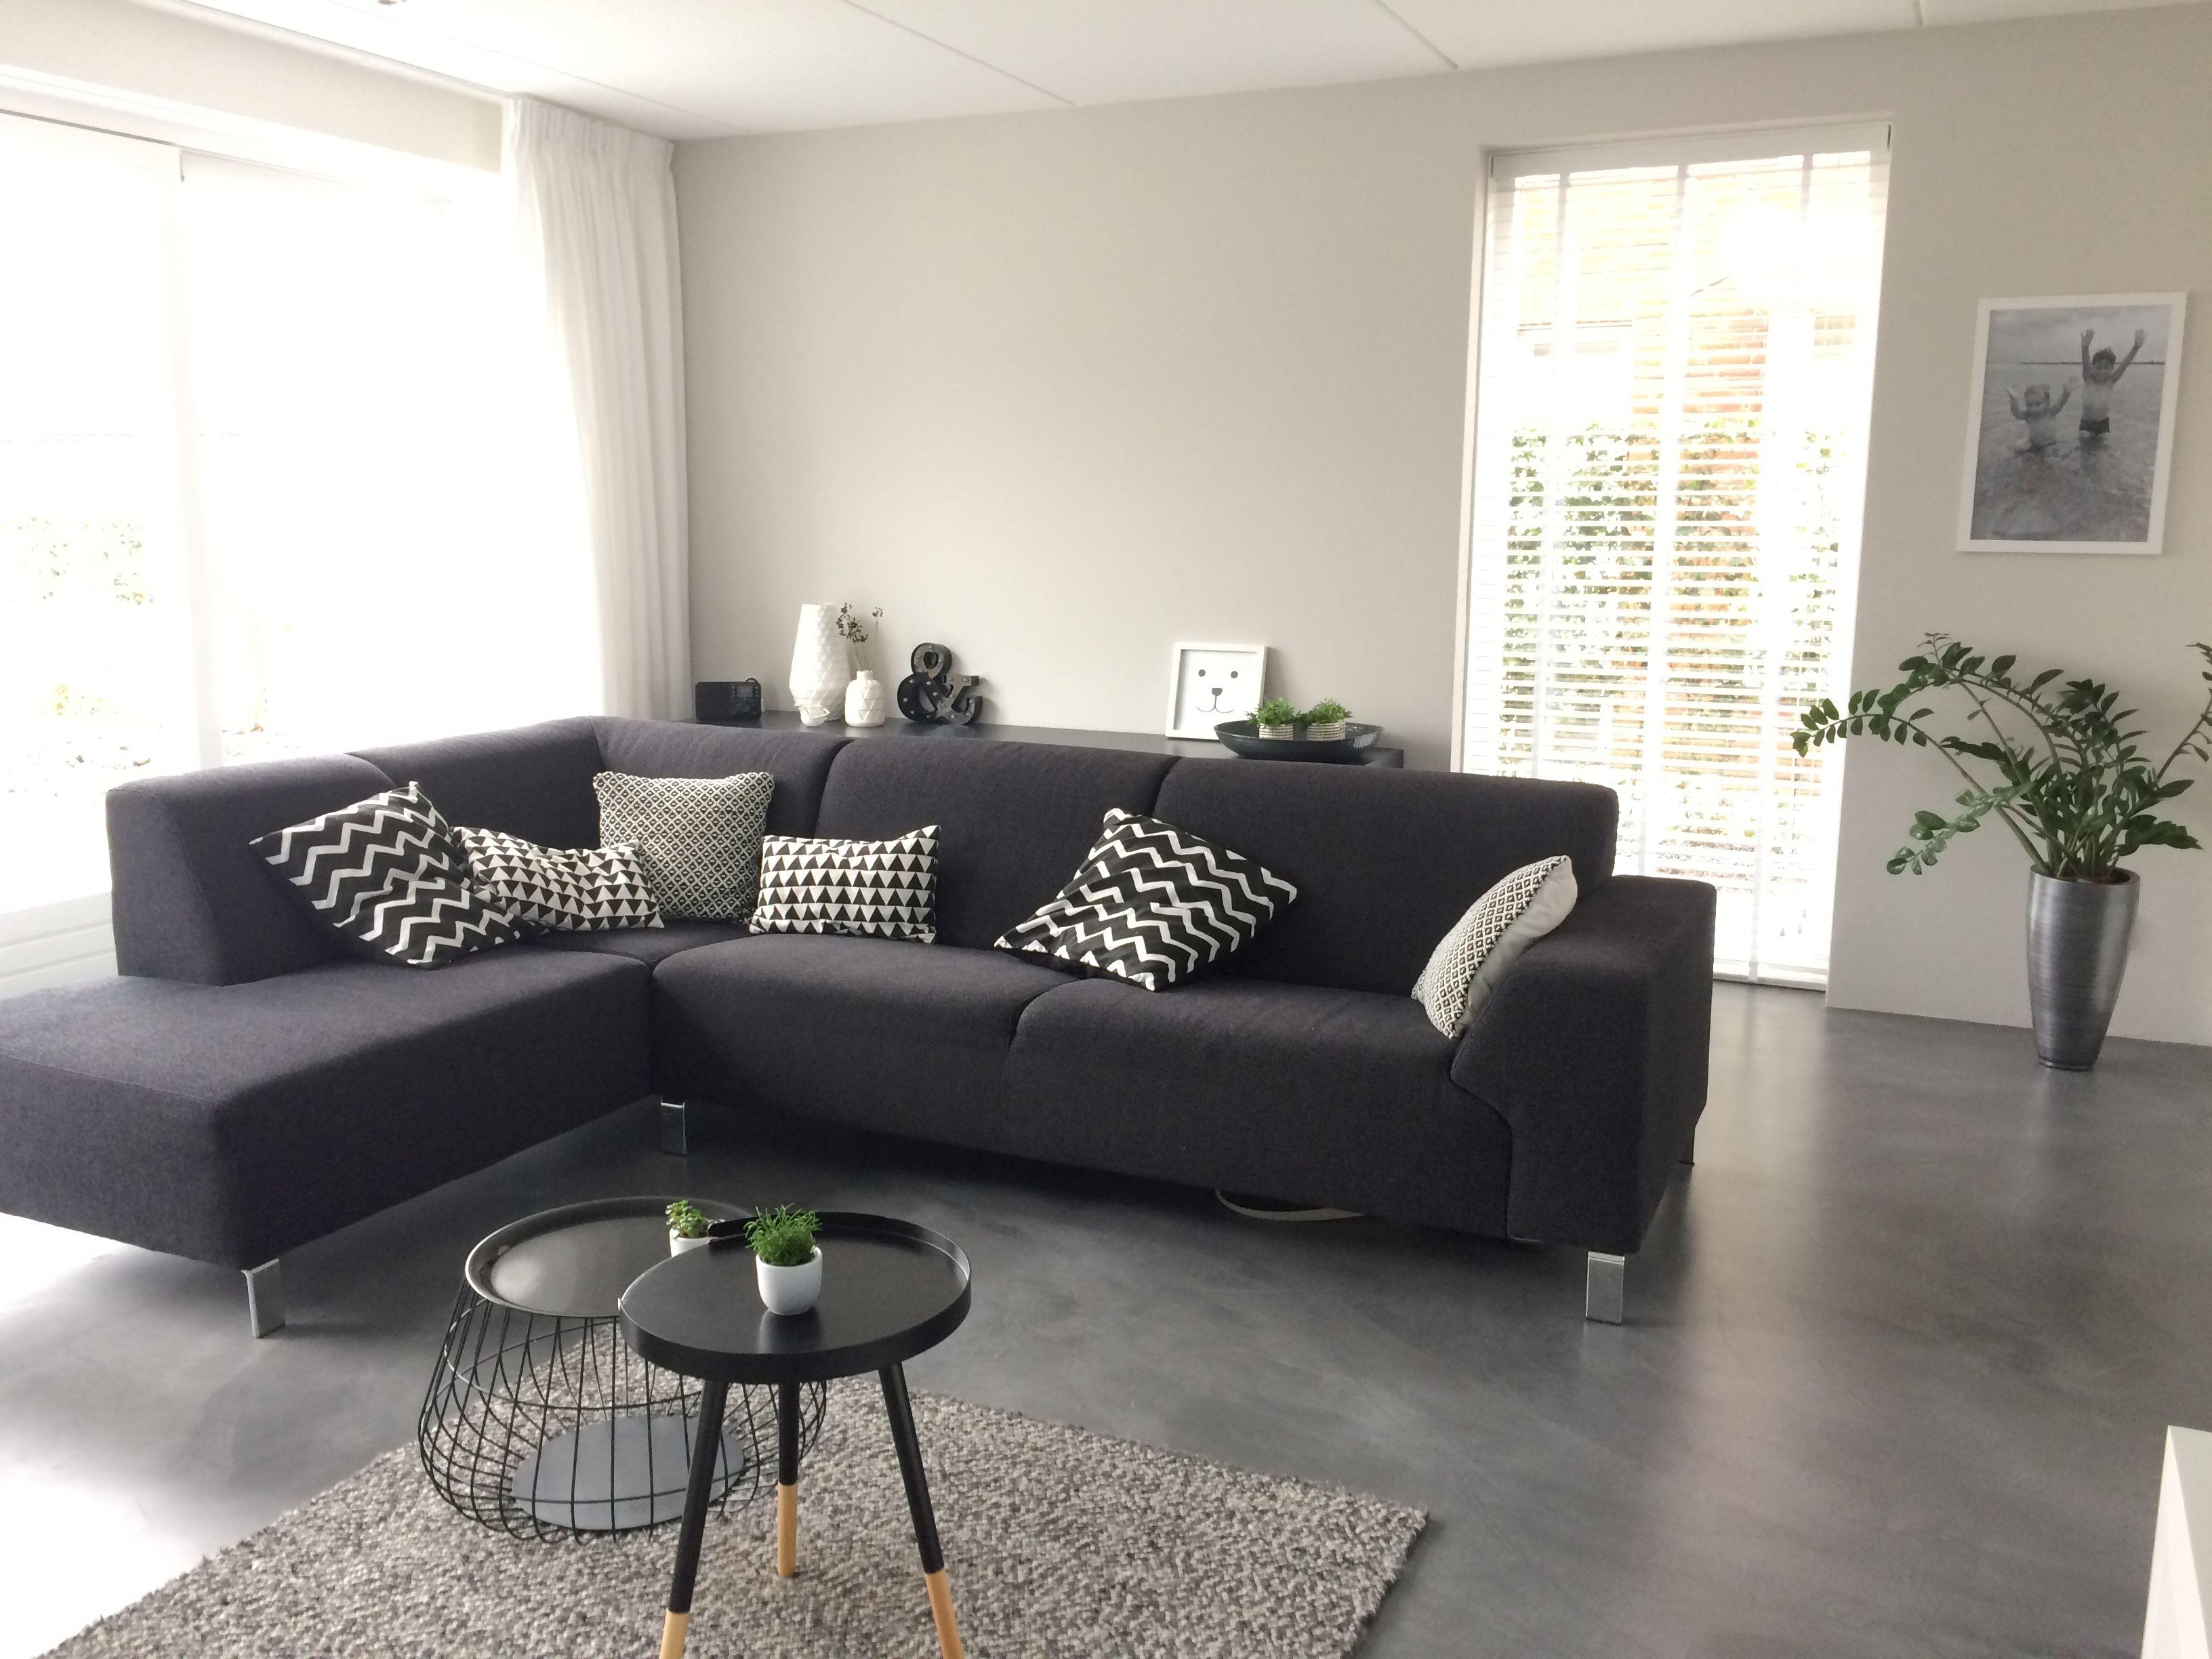 Zwart-wit hoekbank woonkamer moderne woonkamer | CasaTomasouw ...